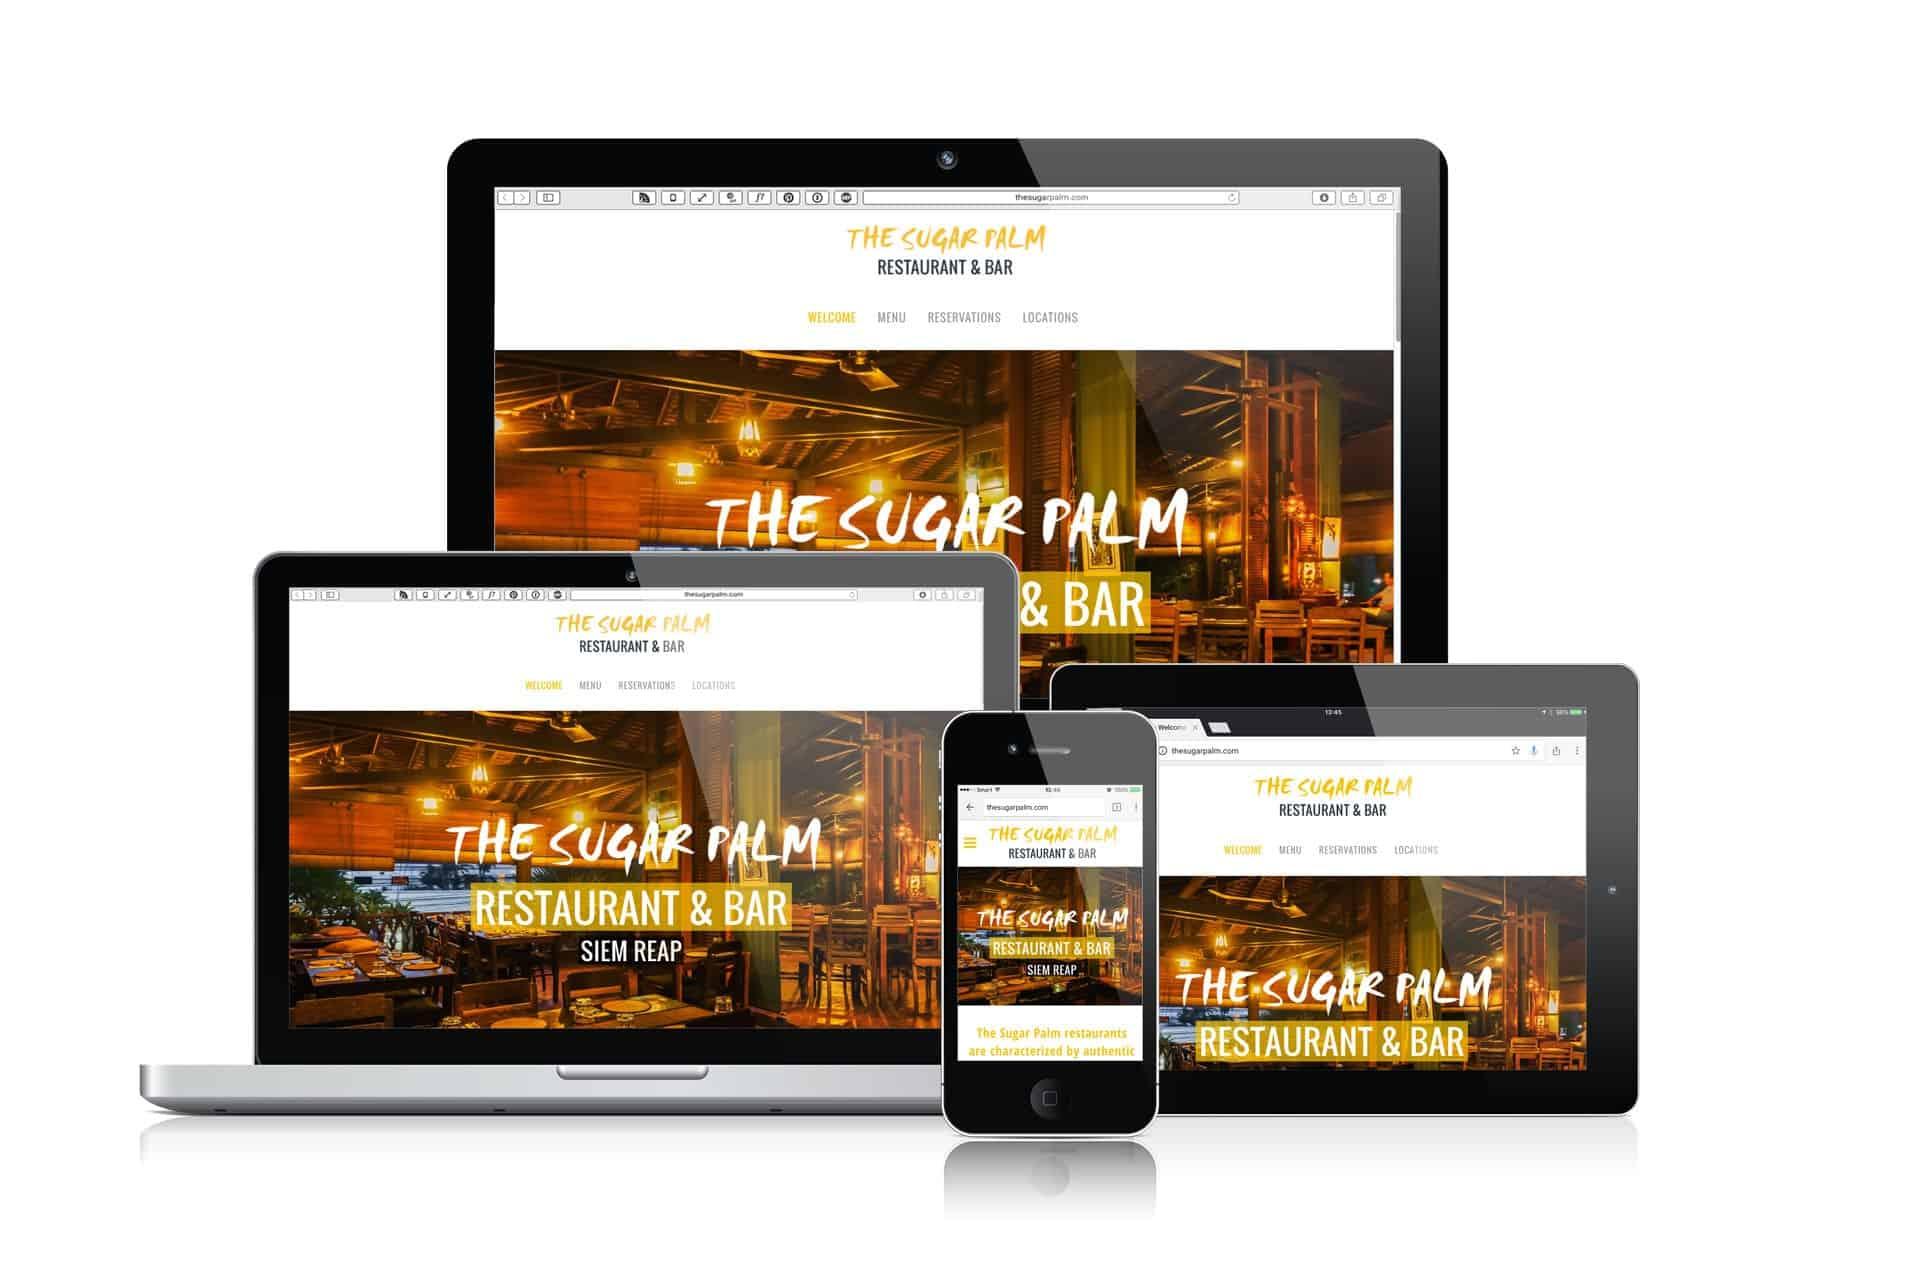 The Sugar Palm Restaurant and Bar, Siem Reap and Phnom Penh. Web Design & Development by Grantourismo Media, a Full Service Digital Media Agency.